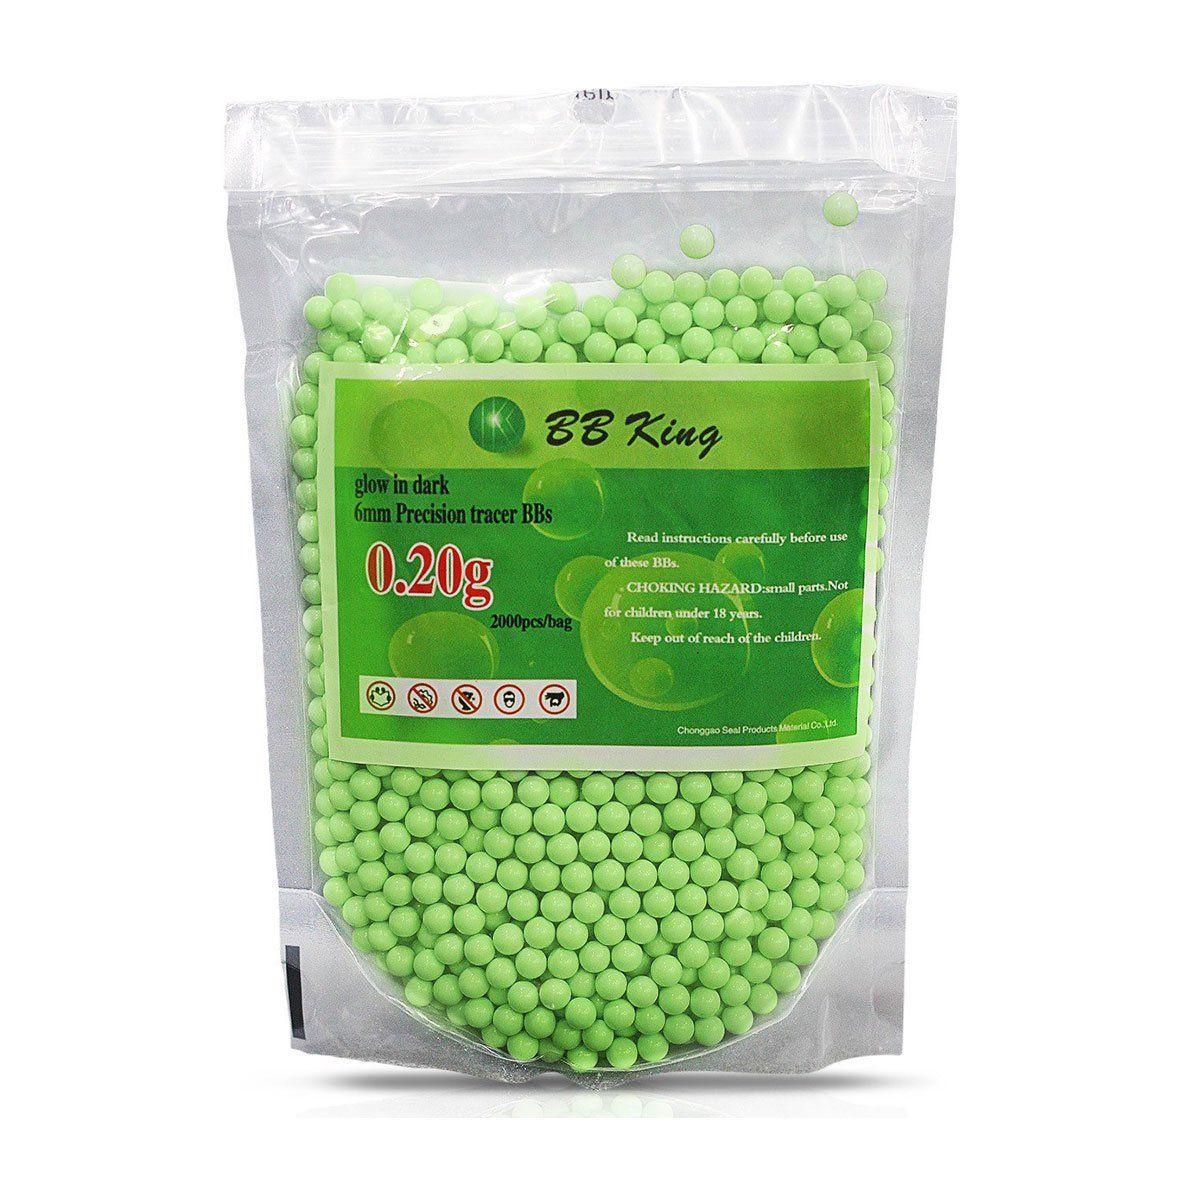 Esferas Plásticas BBs BB King Calibre 6mm 0,20g 2000un